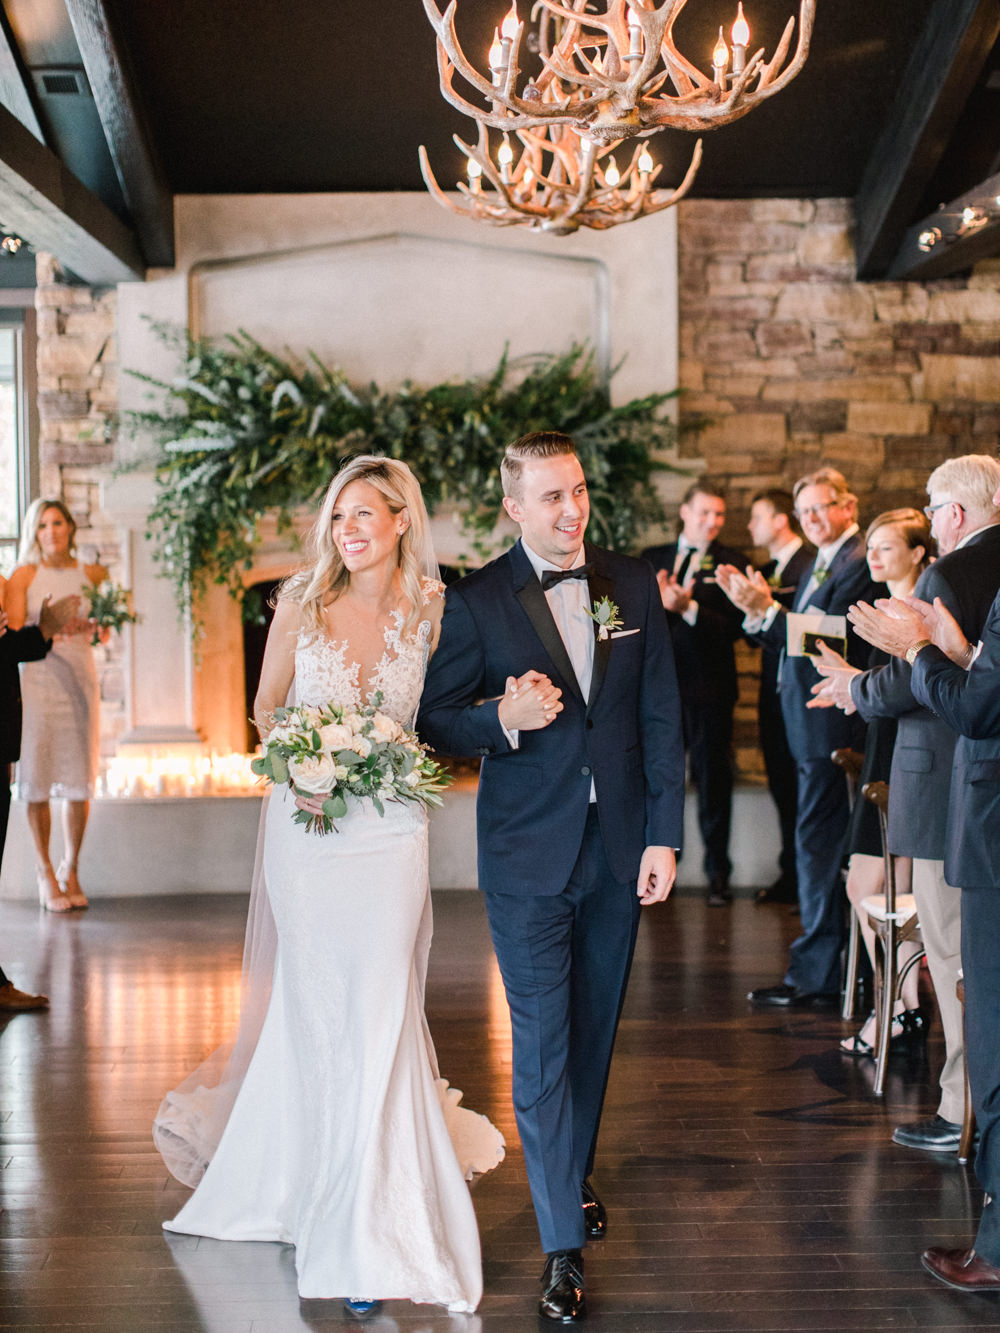 Breatt-and-Katies-romantic-Lake-house-wedding-Calgary-18.jpg